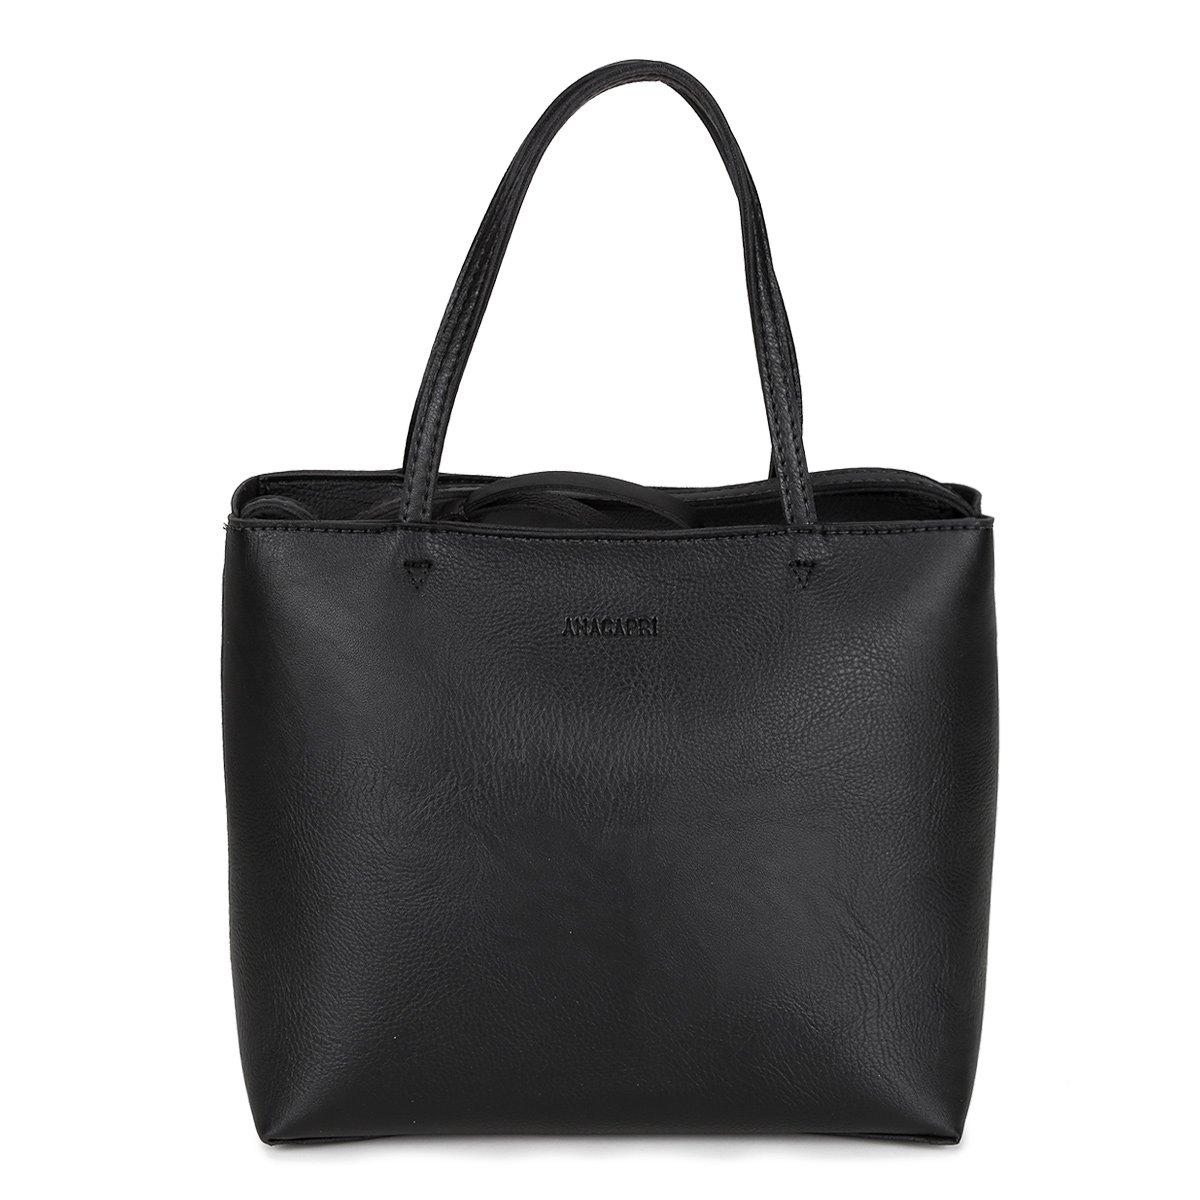 311f967be8 Bolsa Anacapri Shopper Napa Tunisia Feminina - Compre Agora